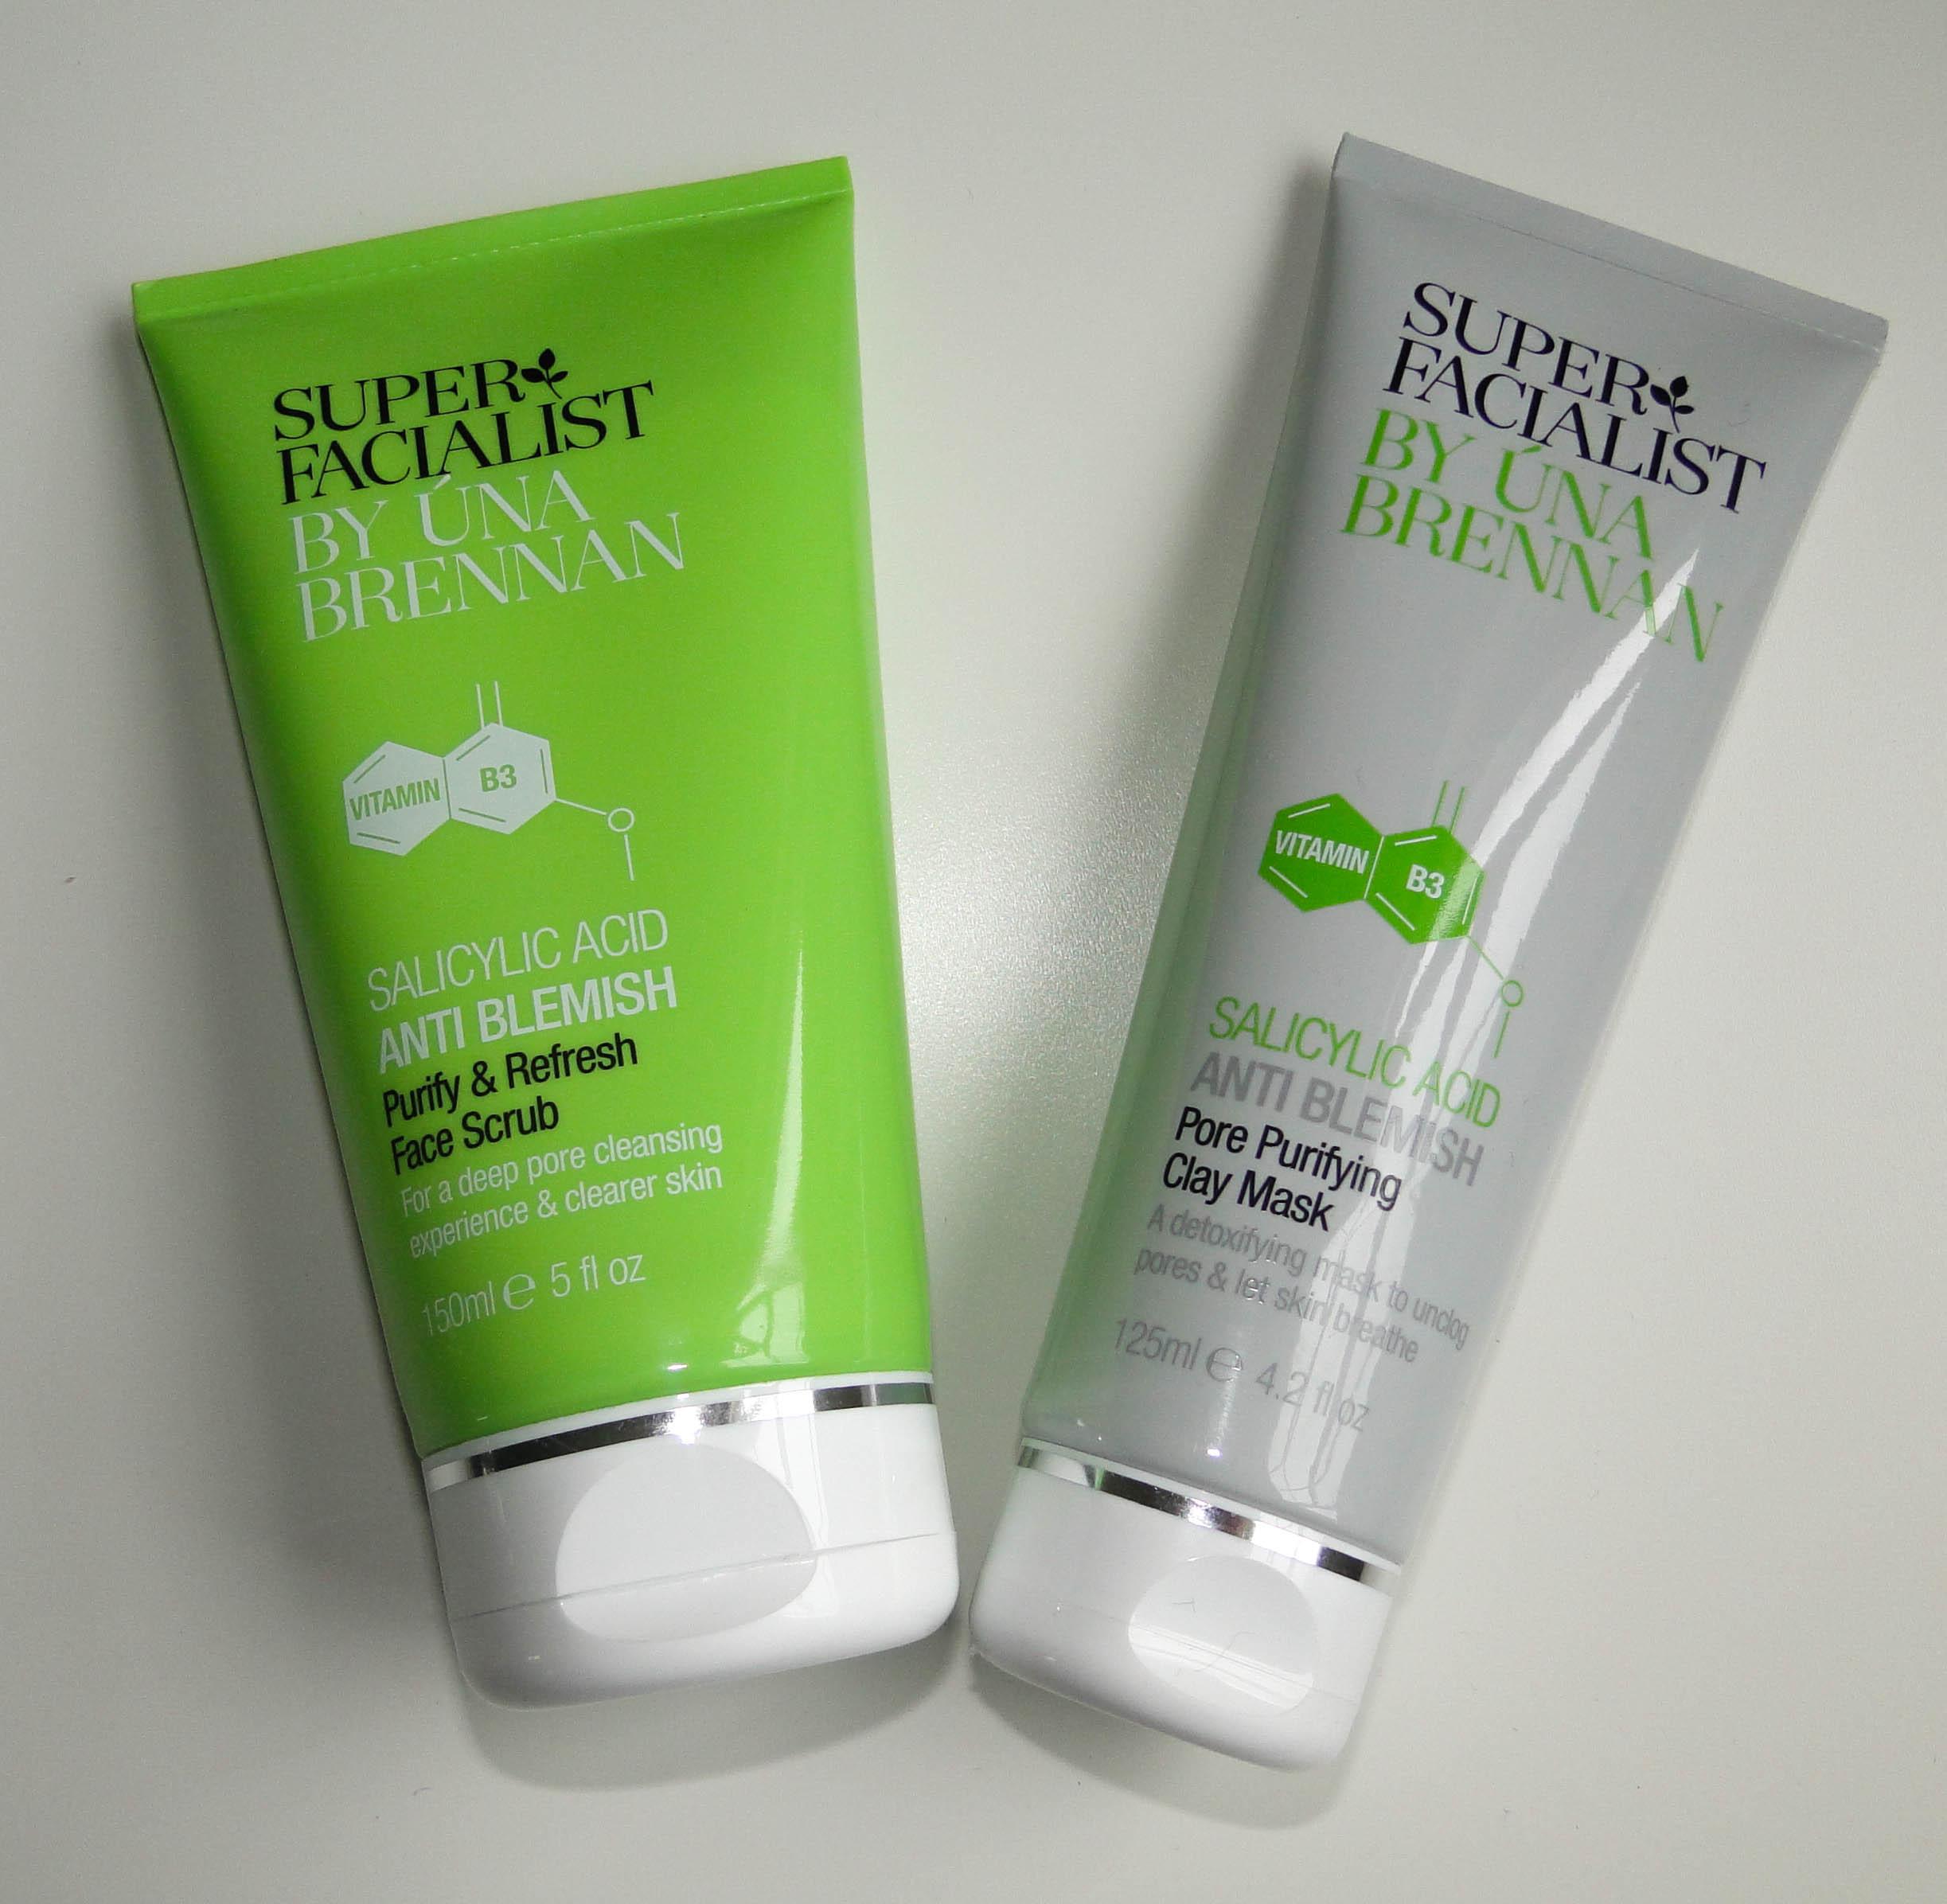 Una Brennan Anti Blemish Skincare